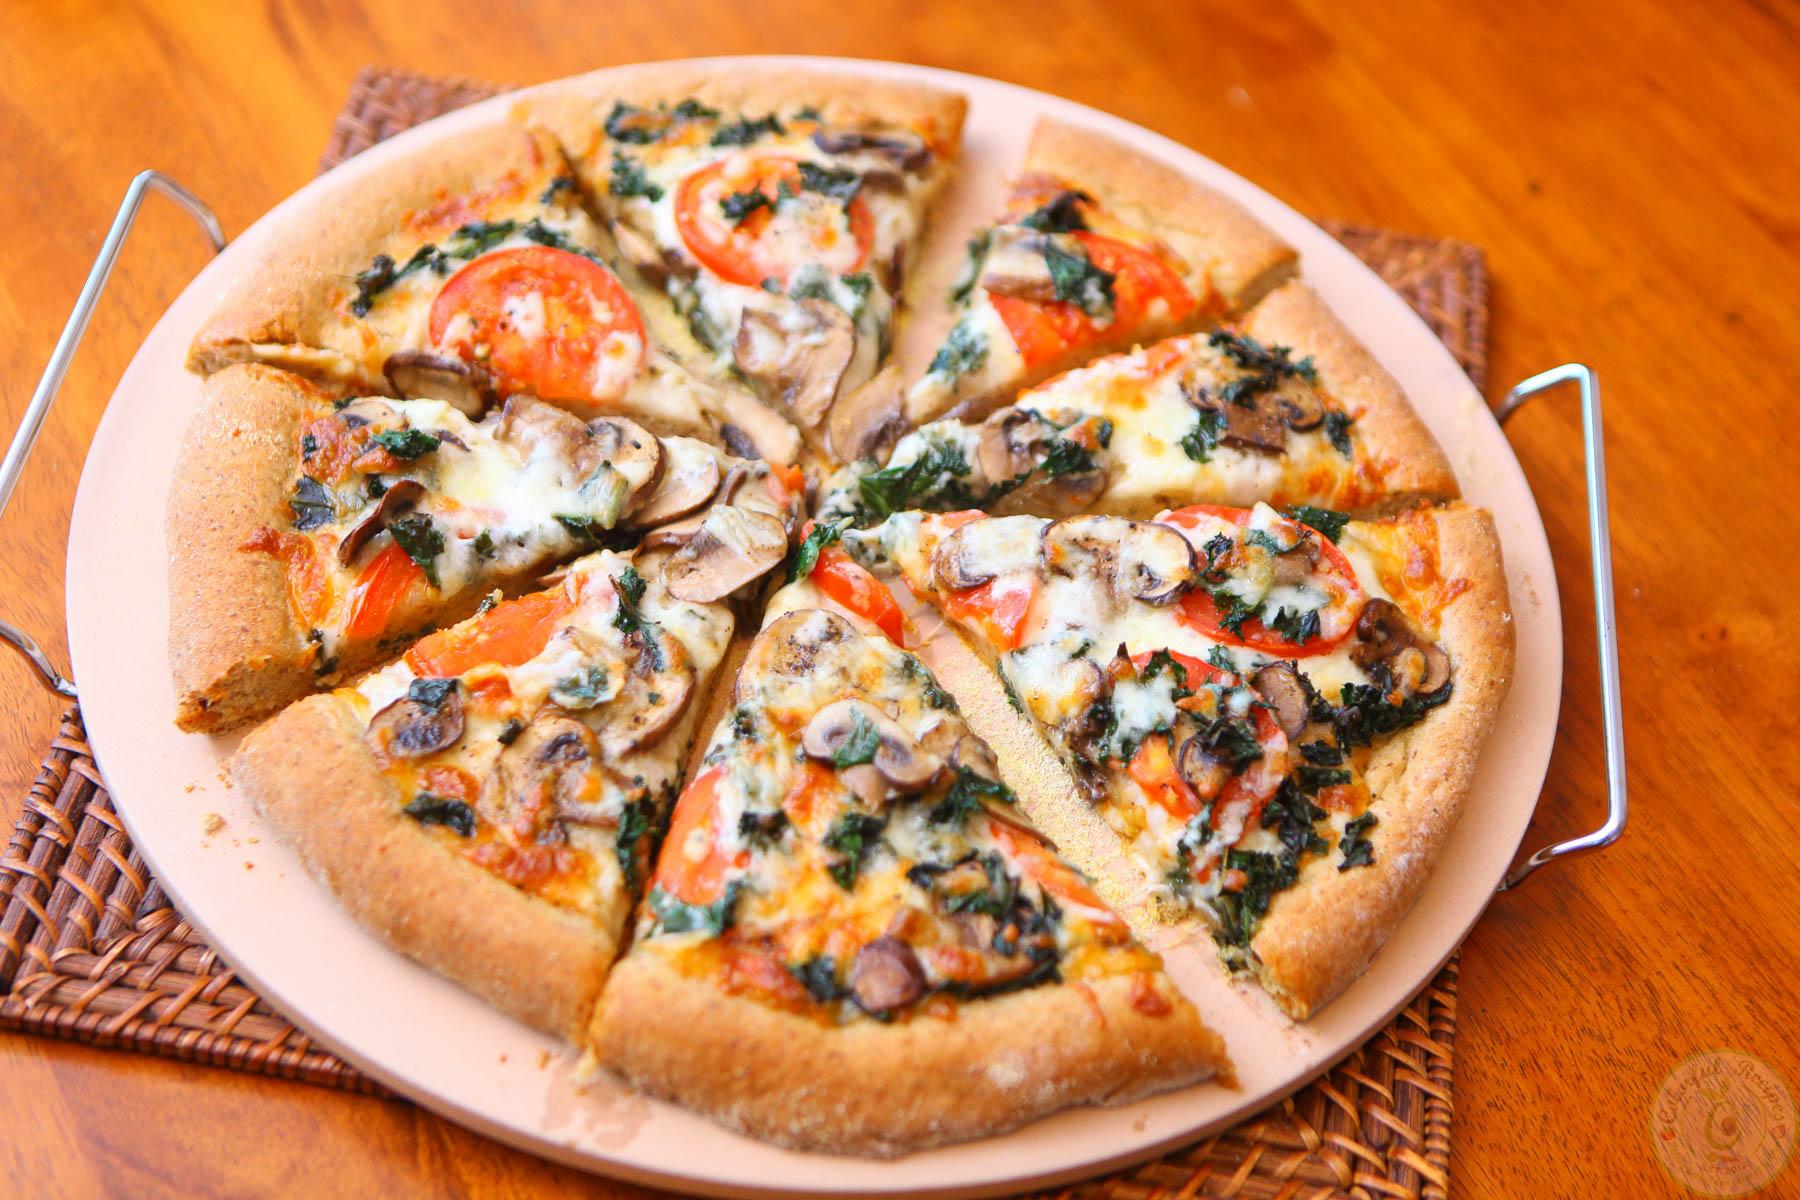 Flax Whole Wheat Kale Pizza